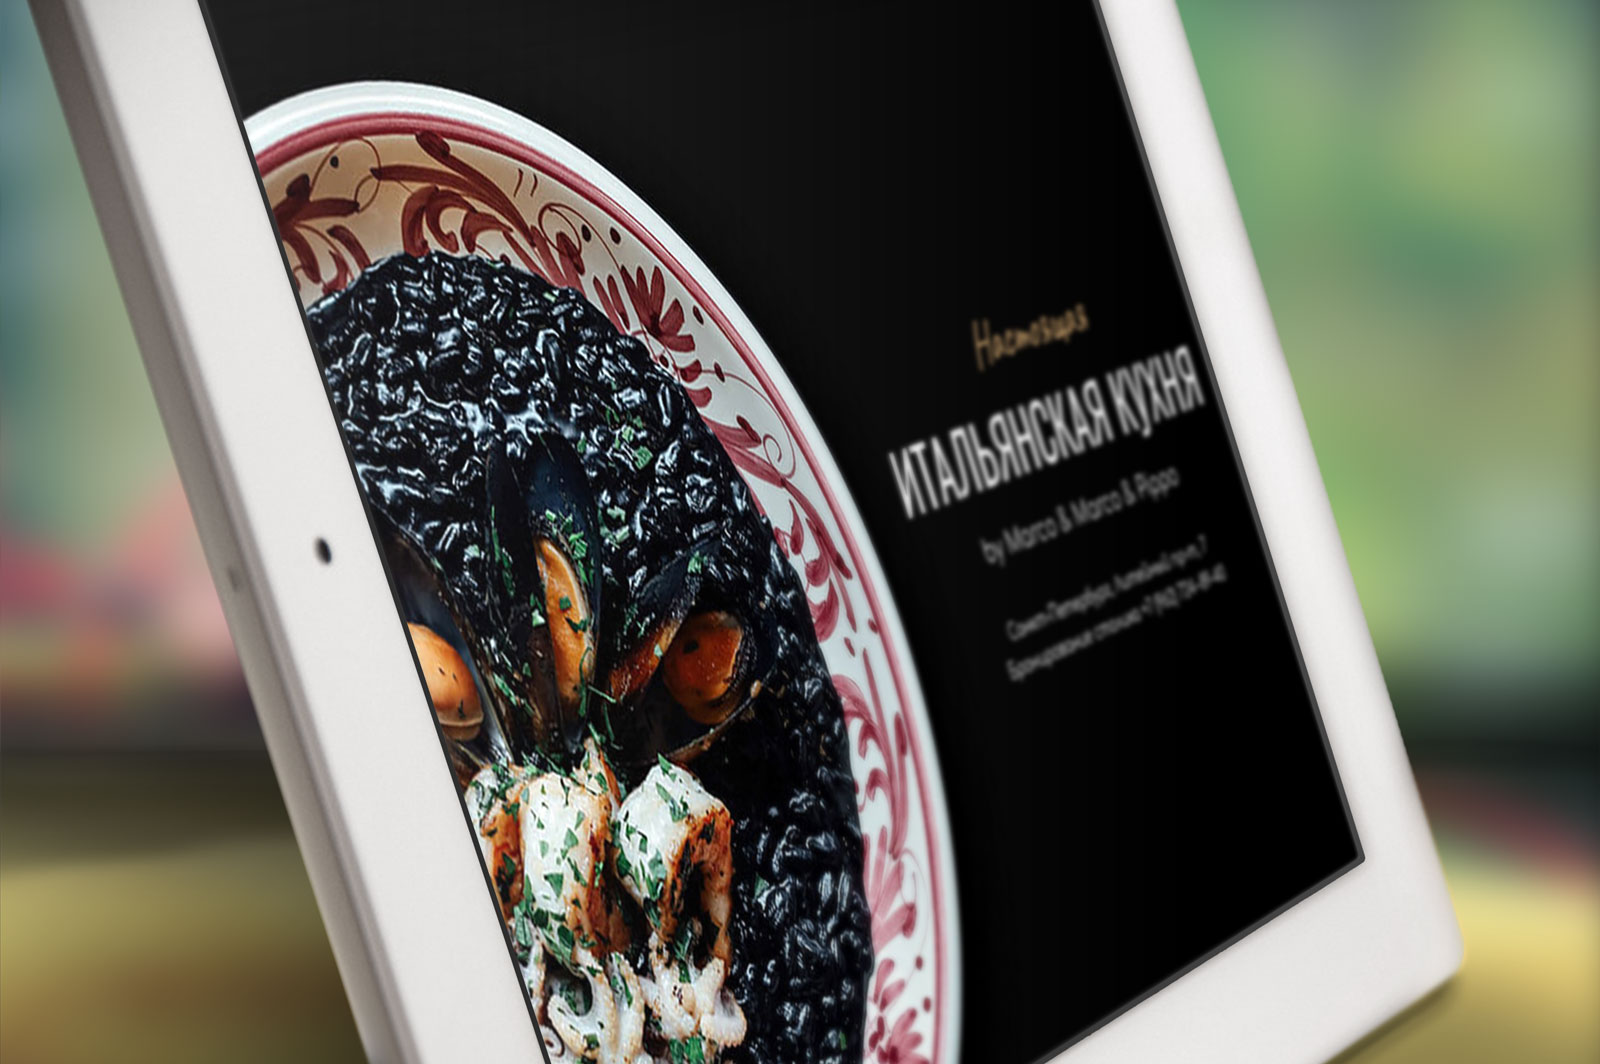 Сайт итальянского ресторана Il Milanese